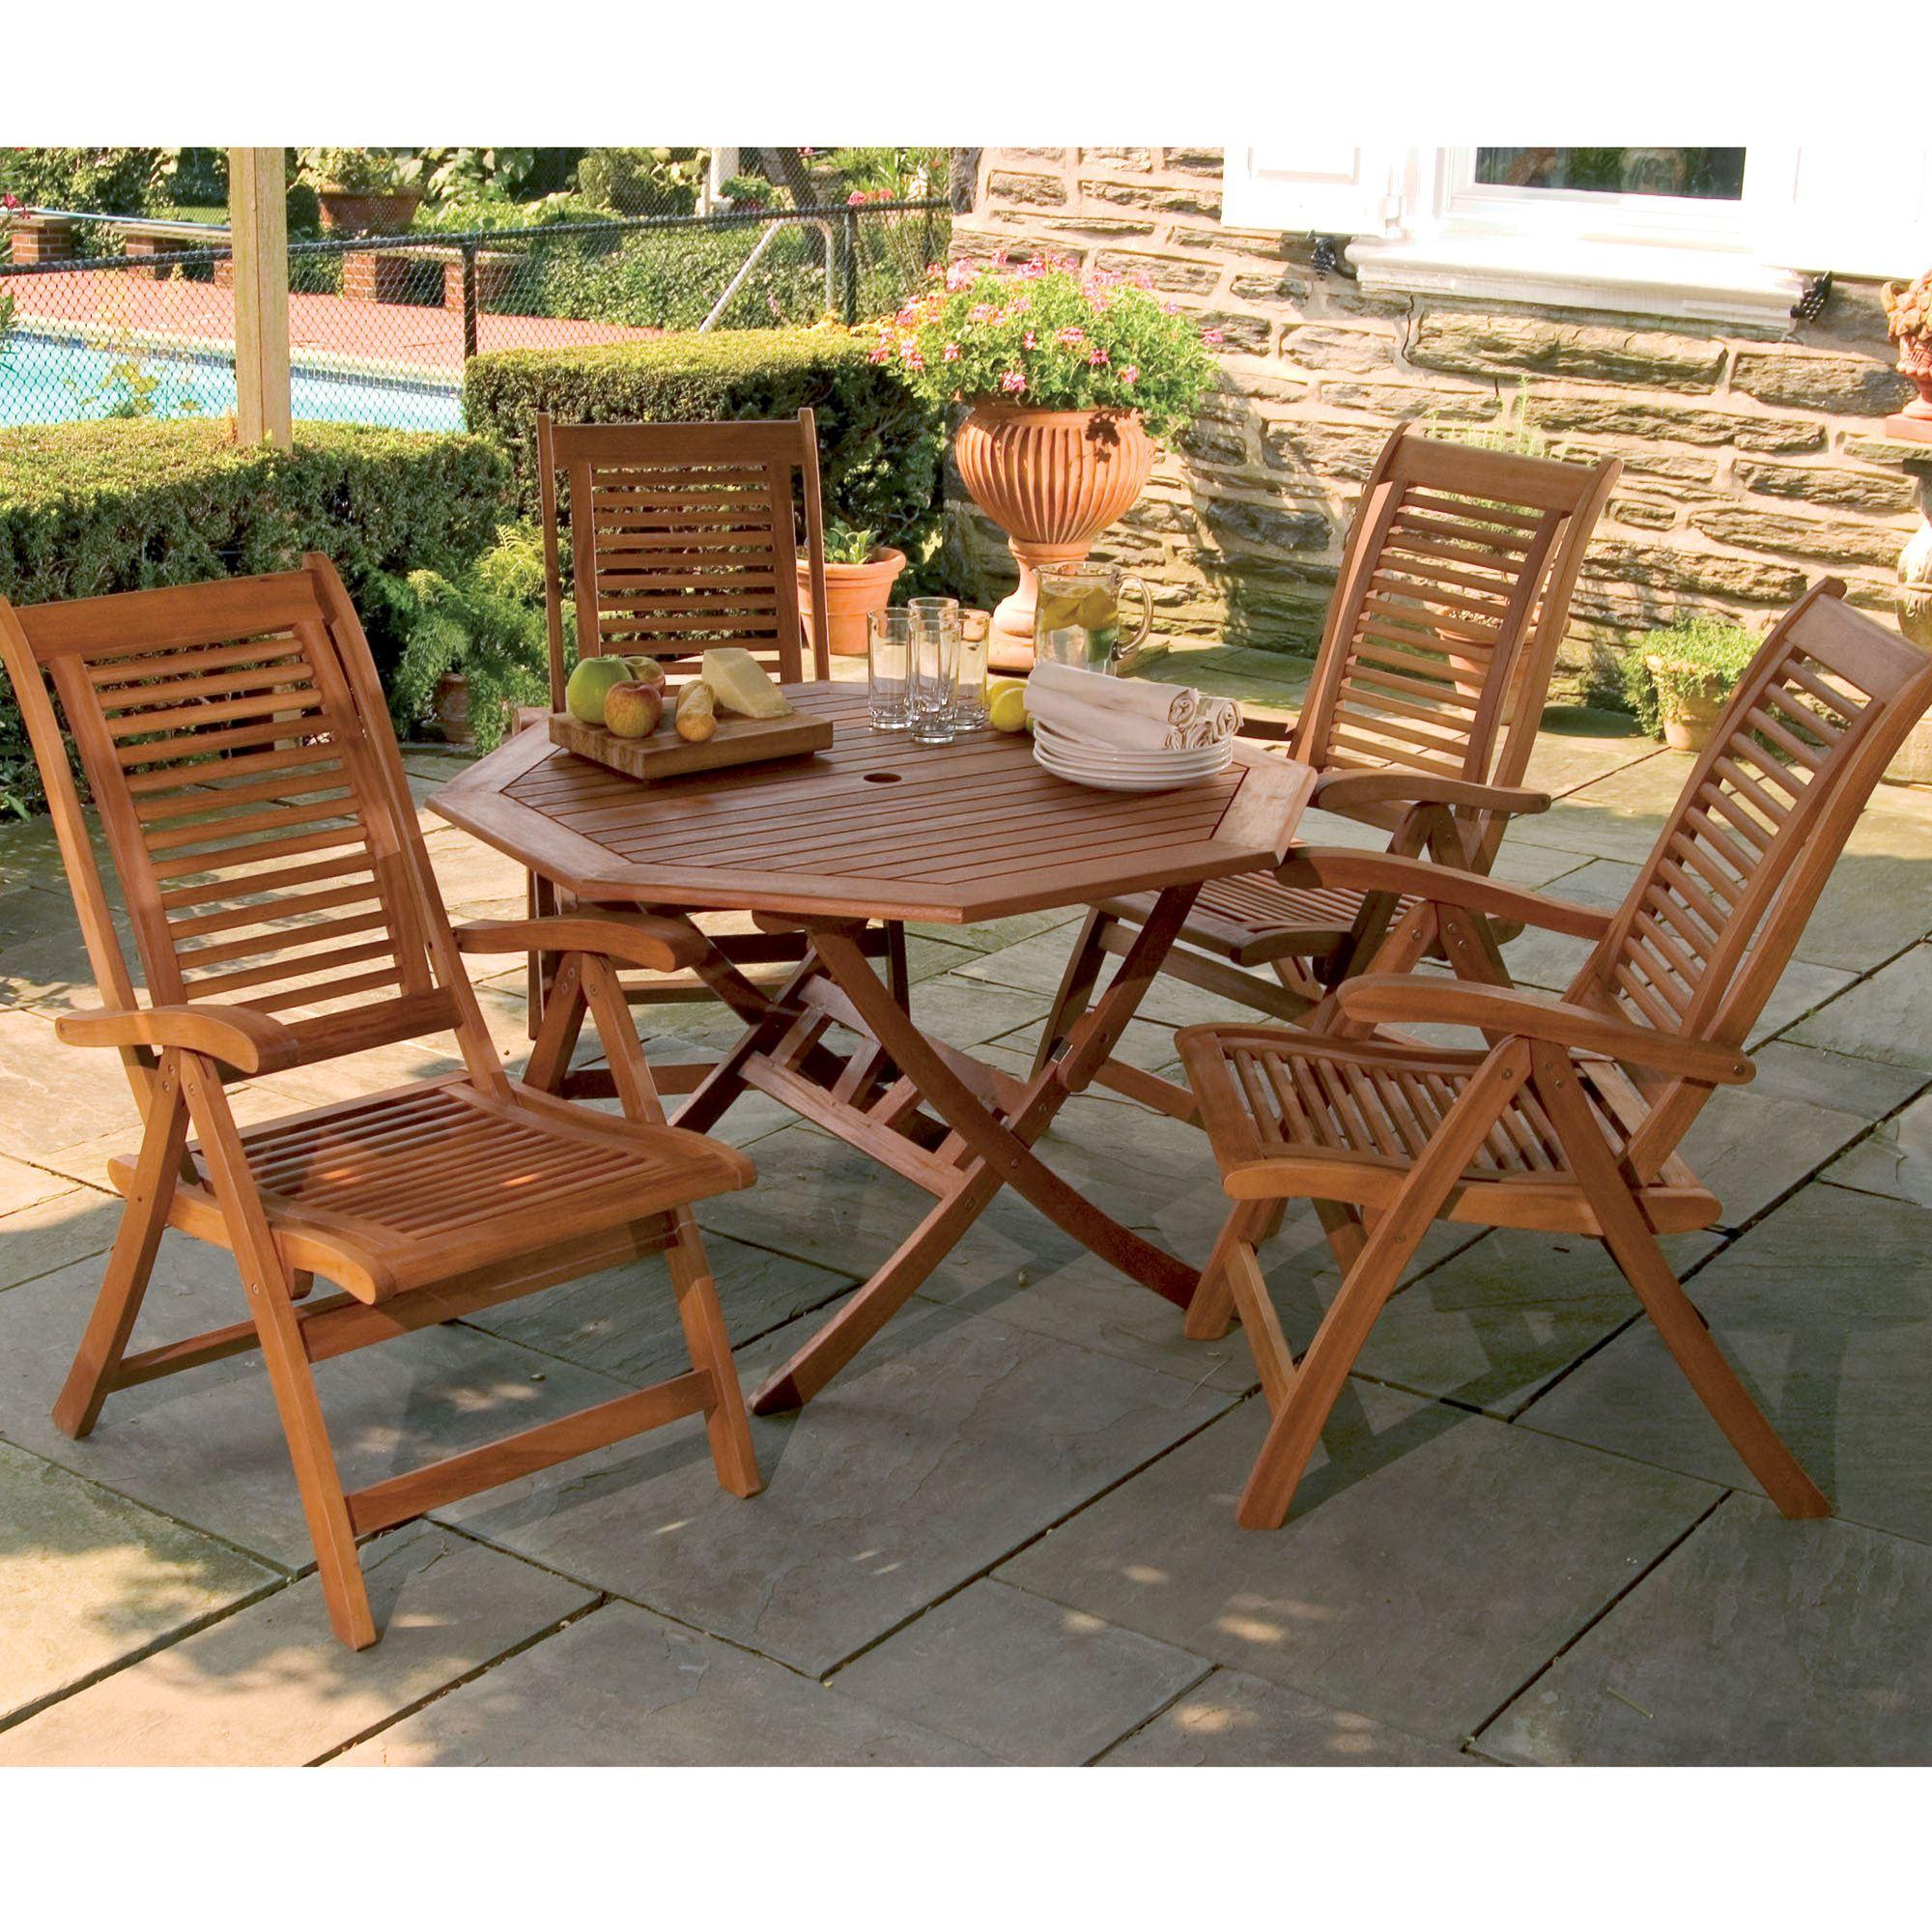 wooden patio furniture lanai shorea wood outdoor dining set GEXVFQE